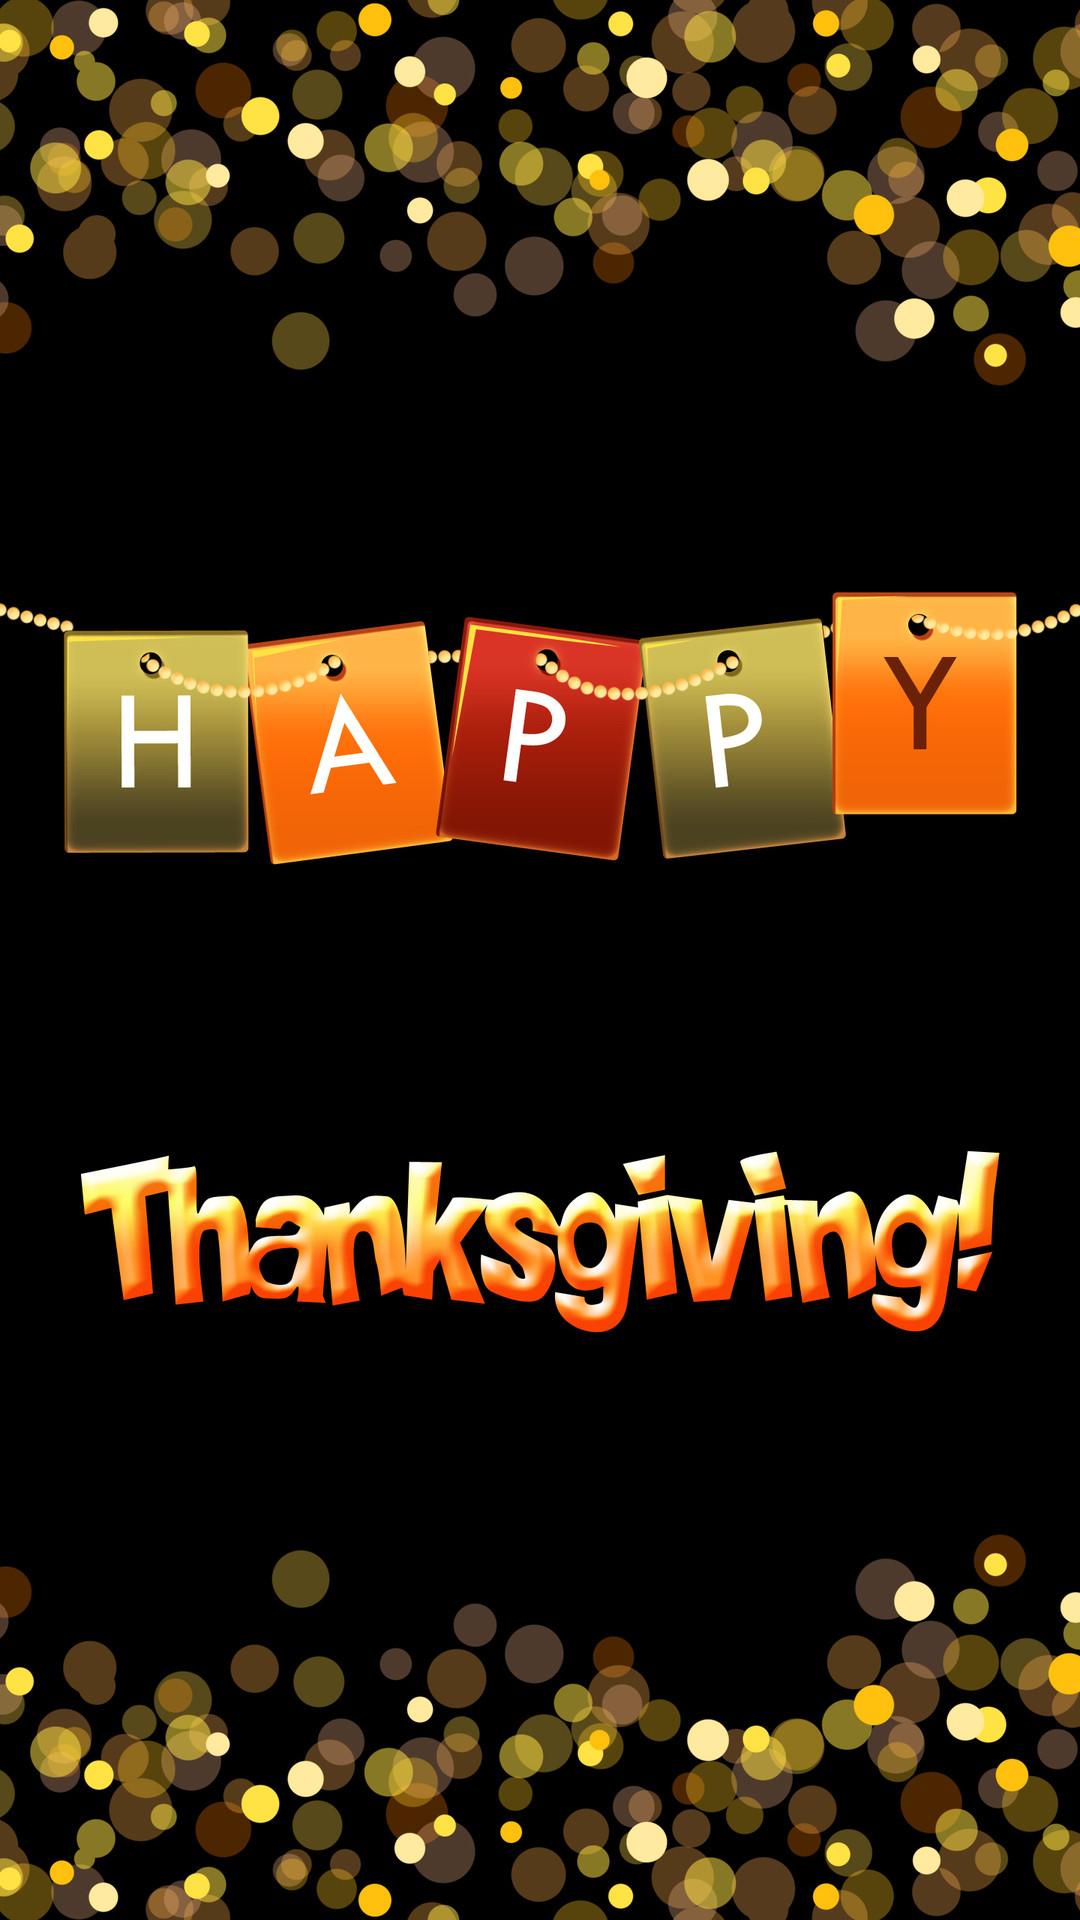 … happy thanksgiving mobile wallpaper 21308 …